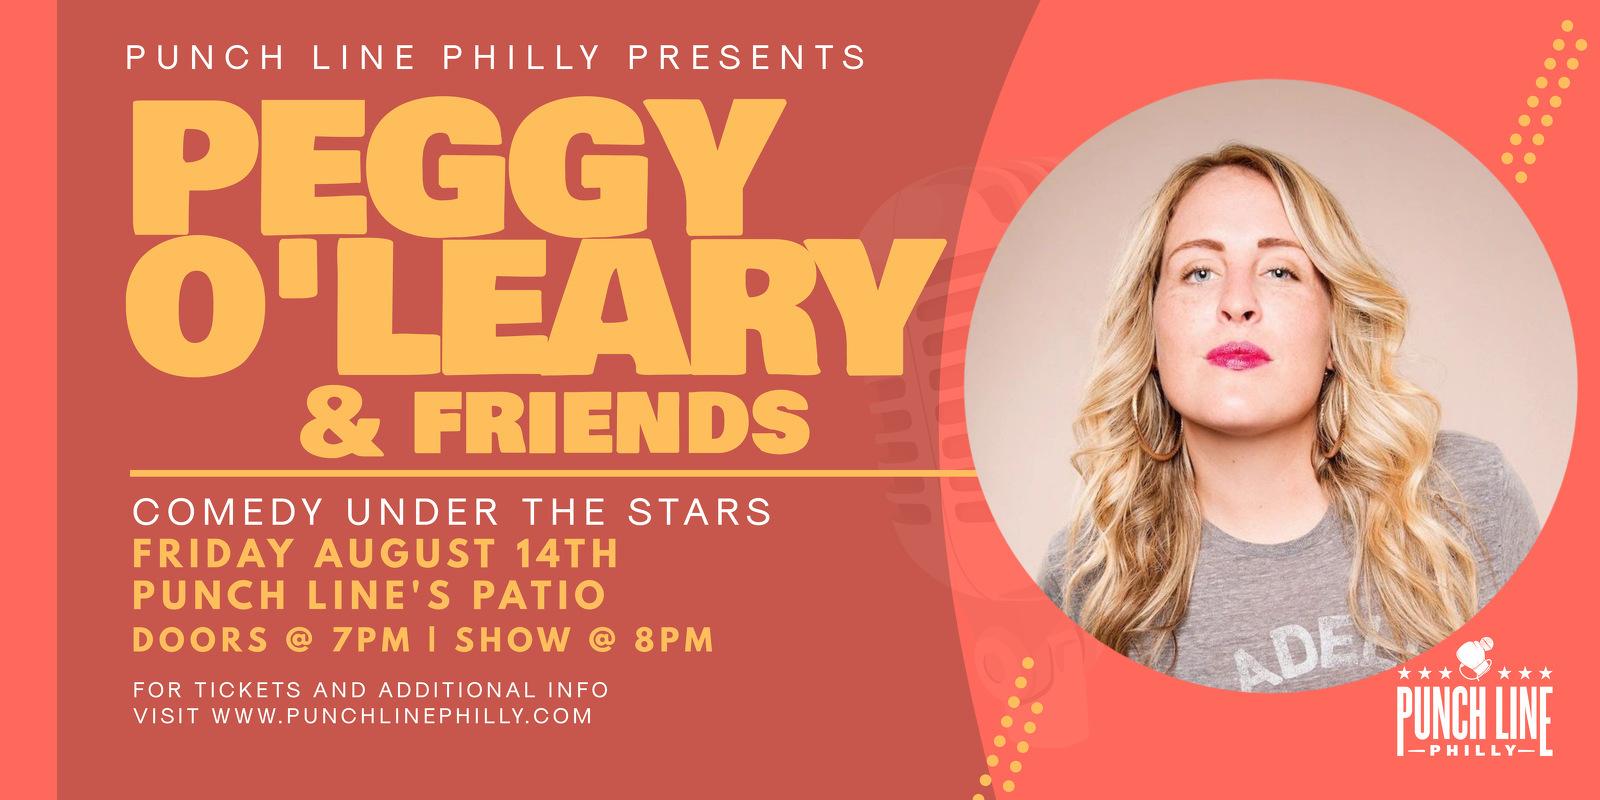 Peggy O'Leary & Friends